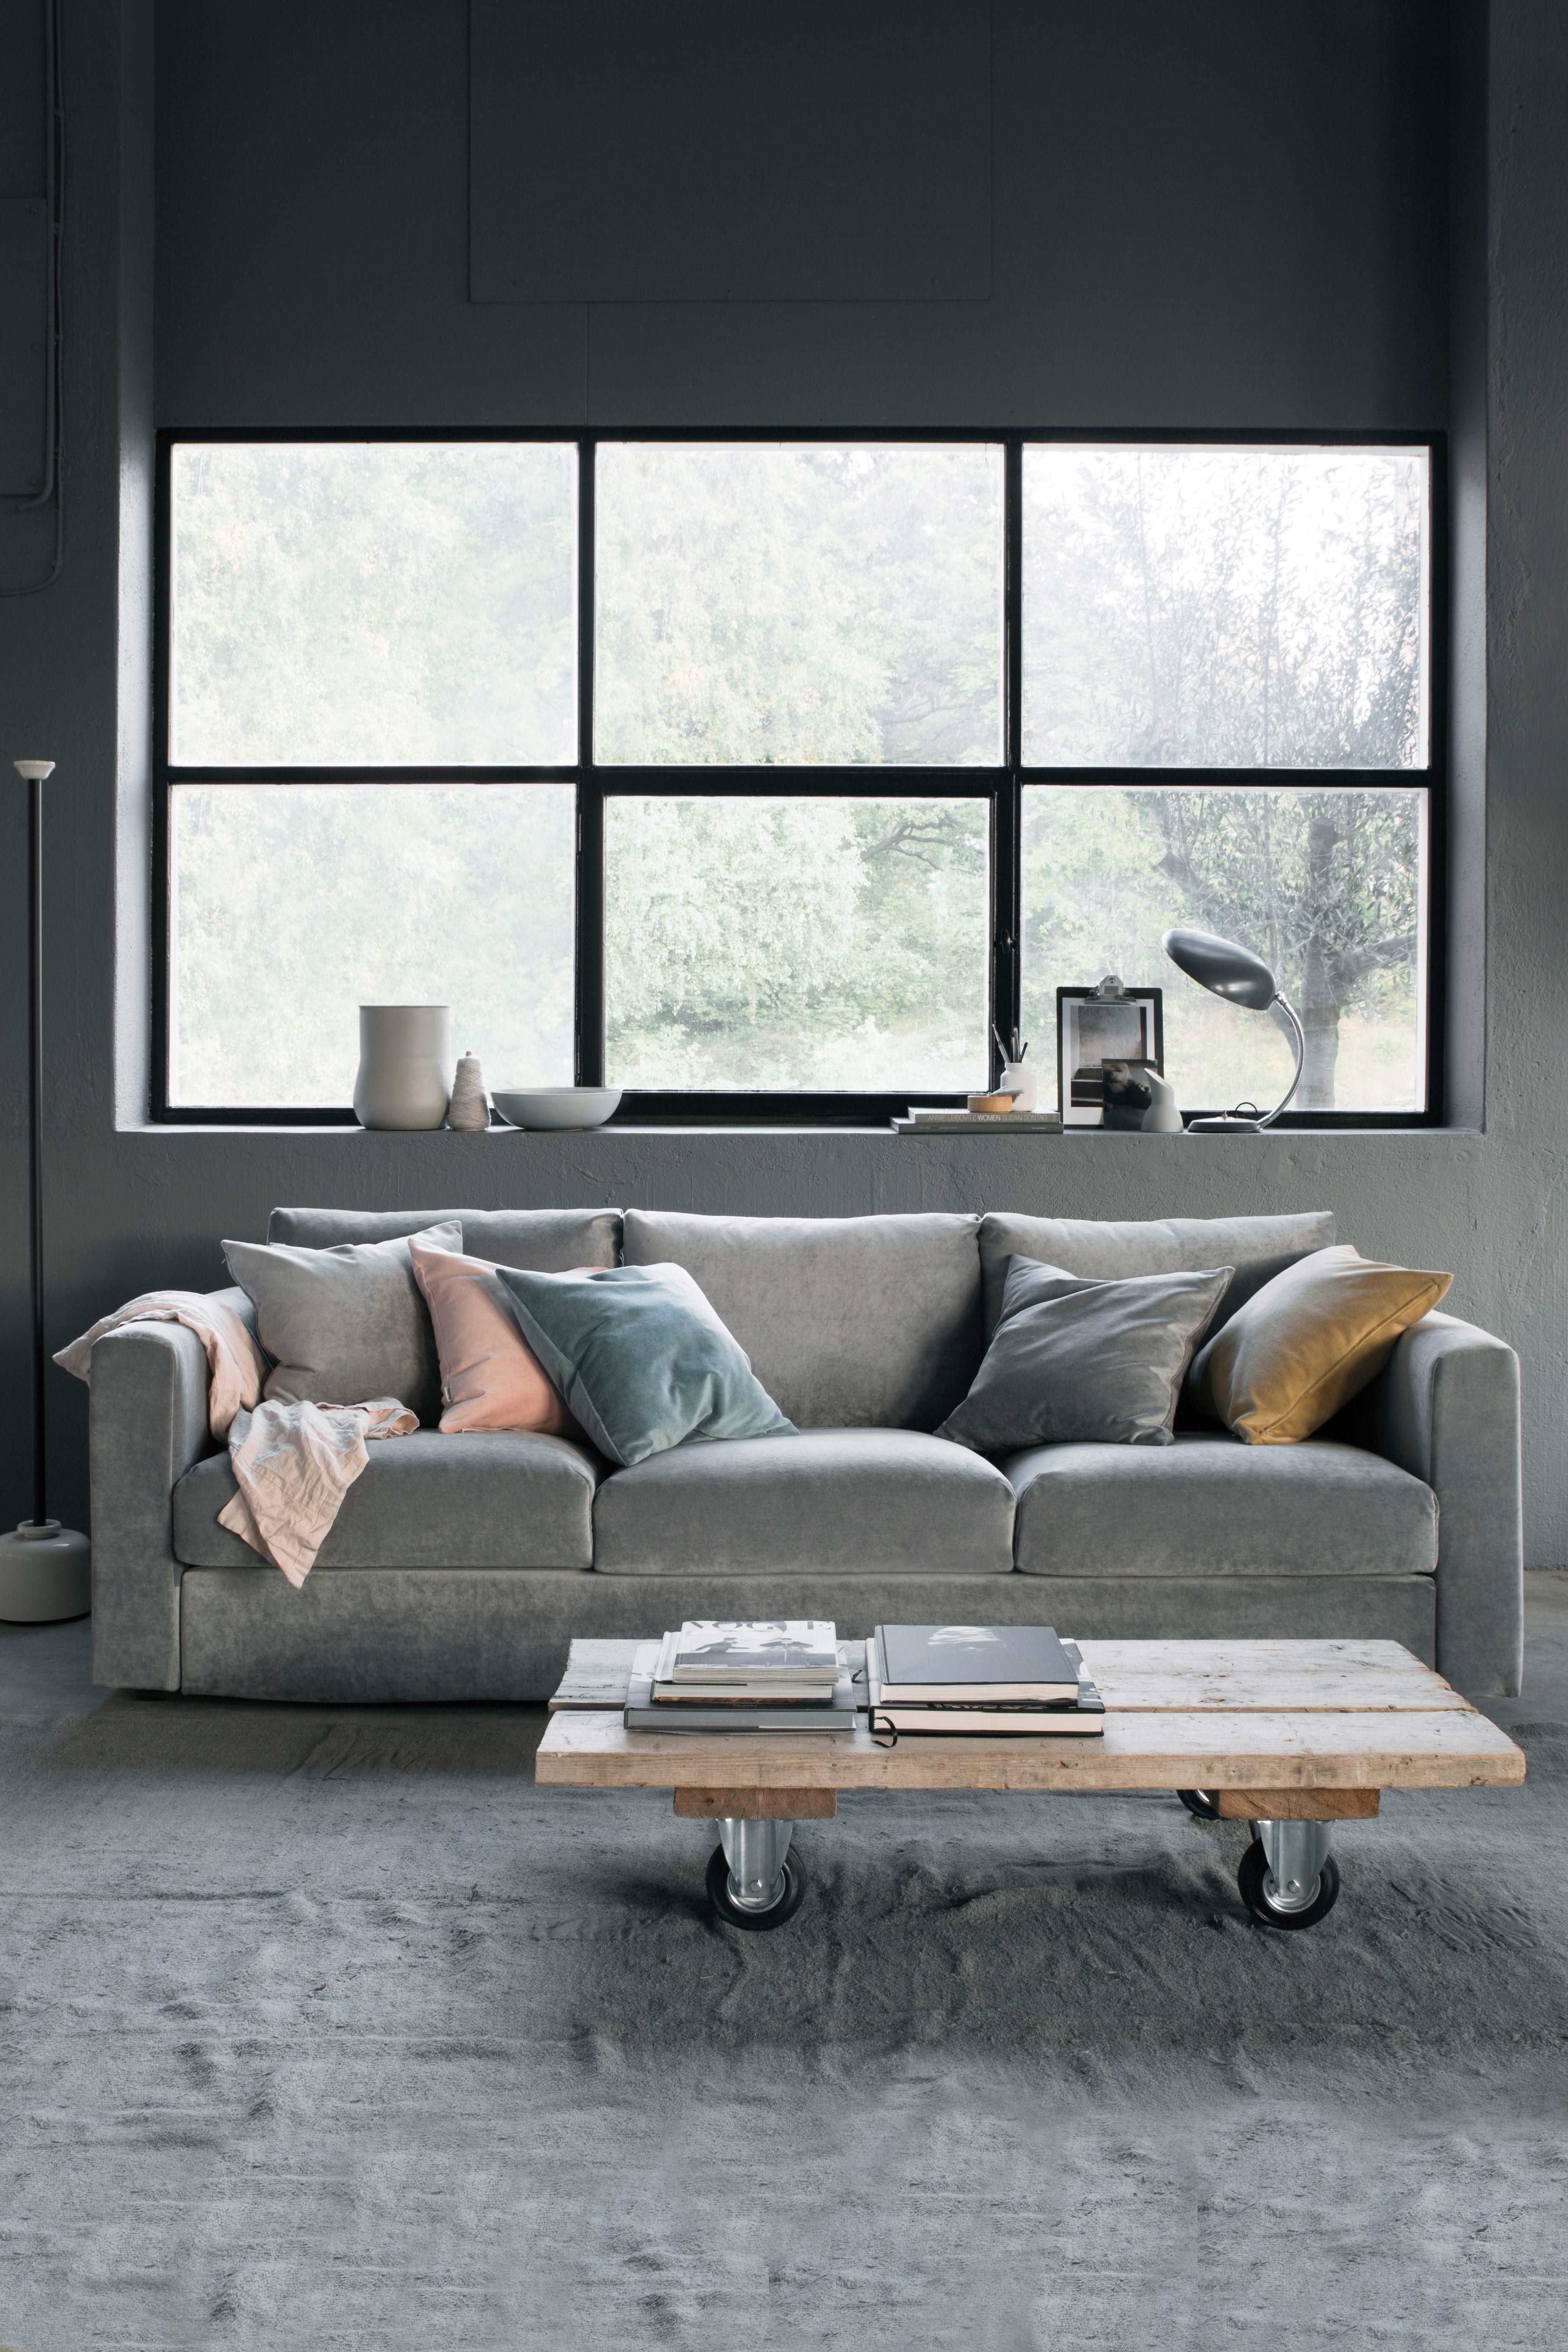 Groovy Ikea Vimle Sofa Review By Bemz Bemz Gamerscity Chair Design For Home Gamerscityorg